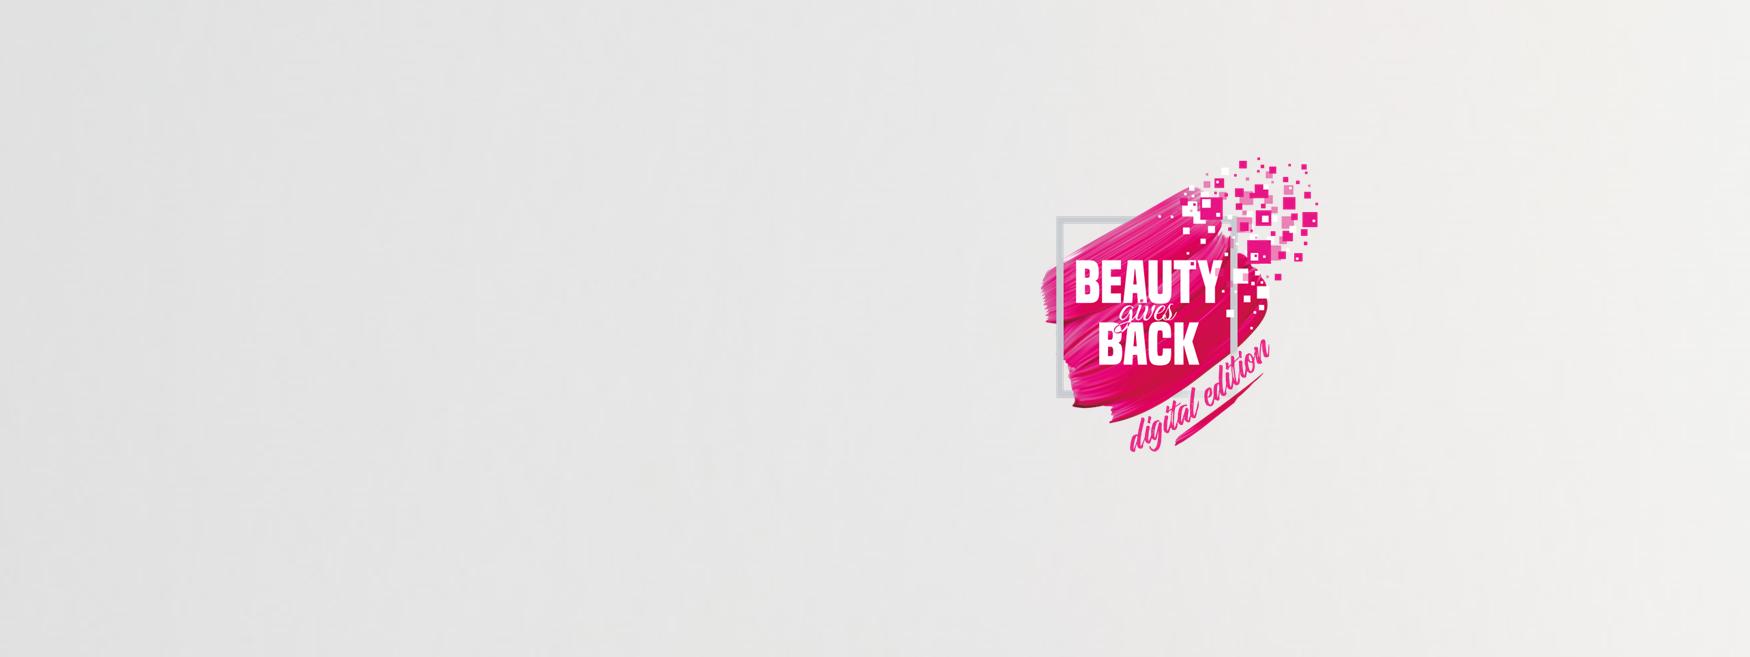 Il logo di Beauty Gives Back Digital Edition